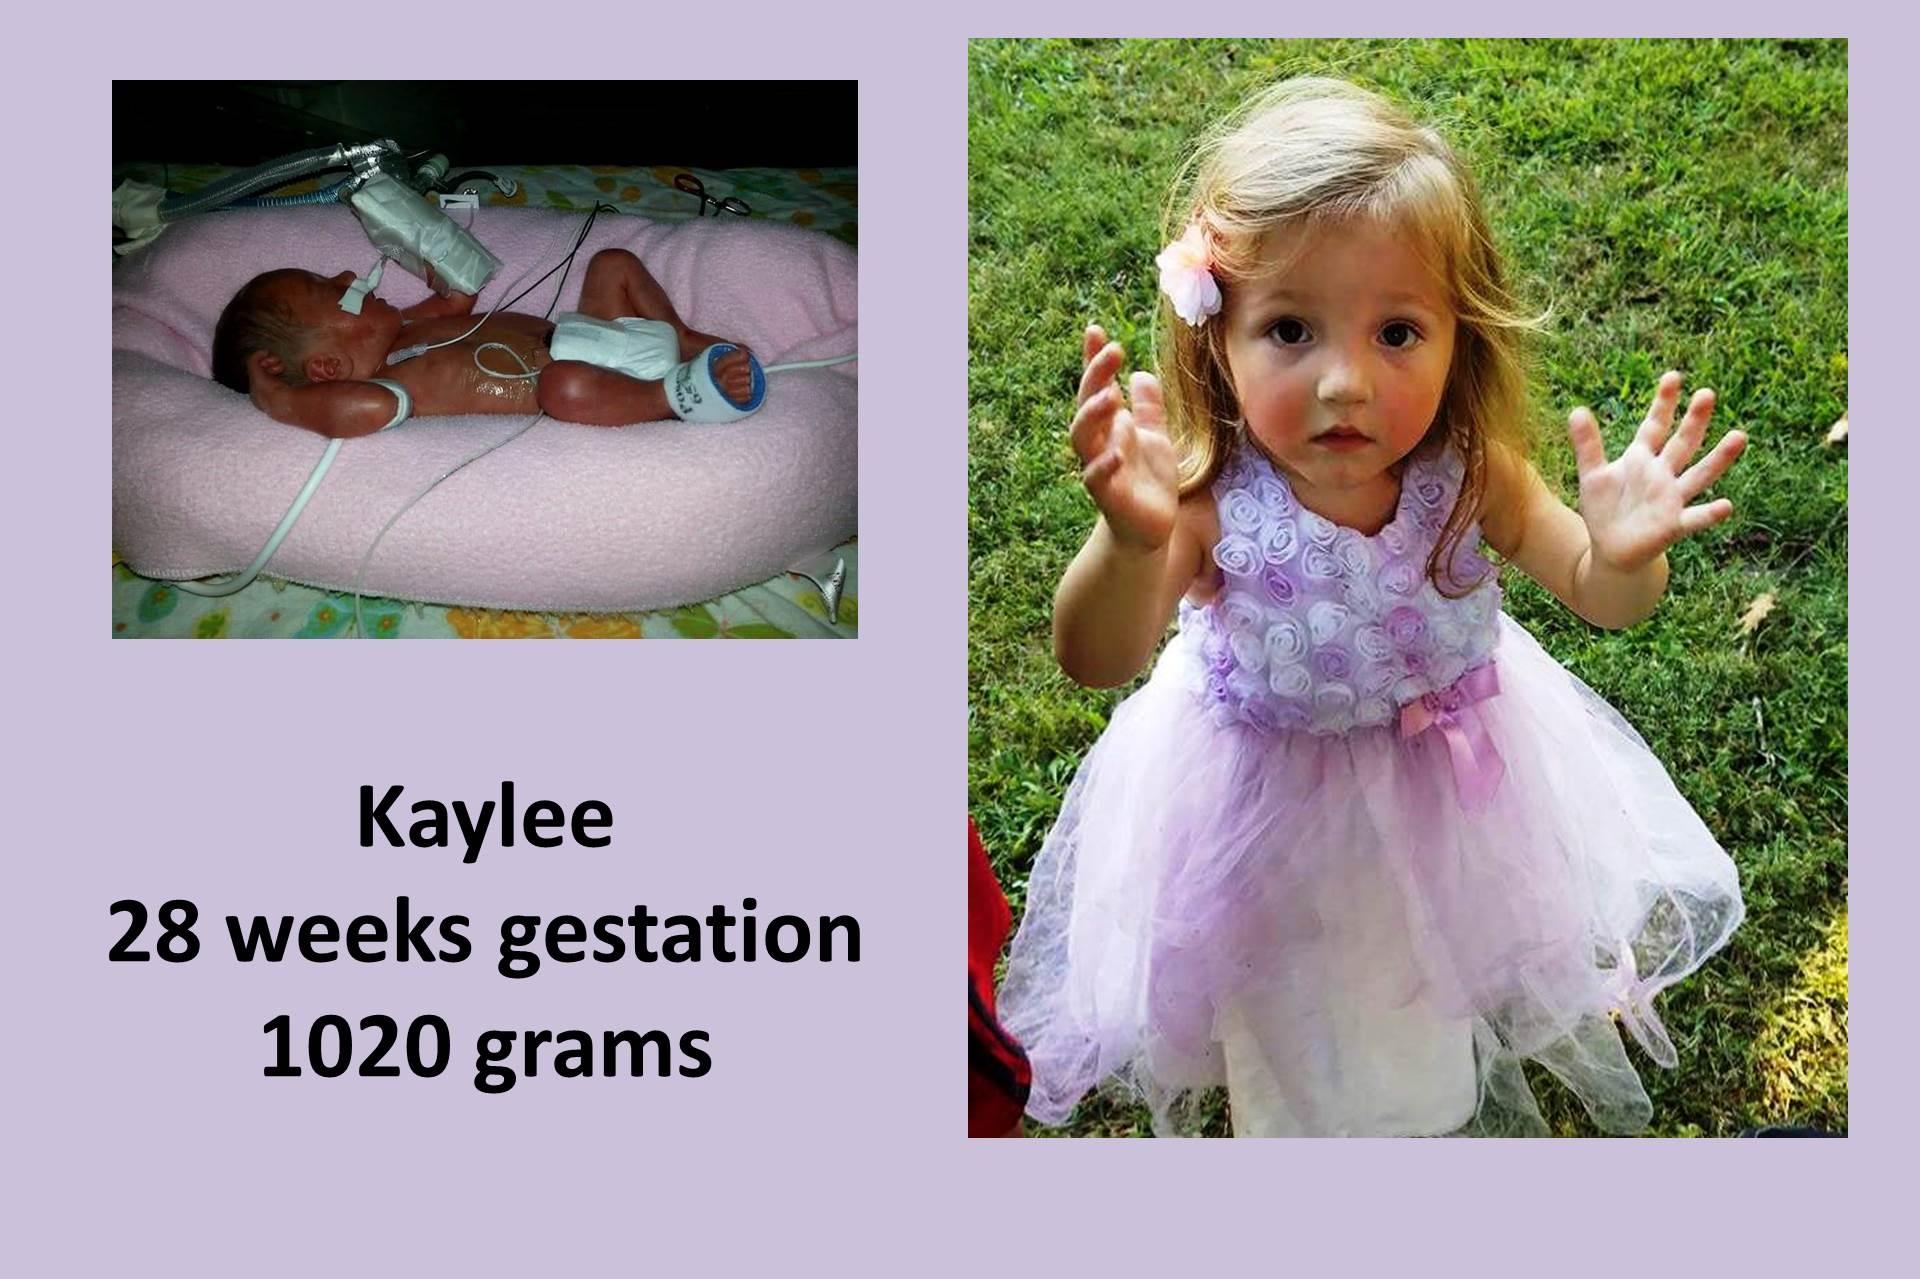 Hallway of Hope: Kaylee